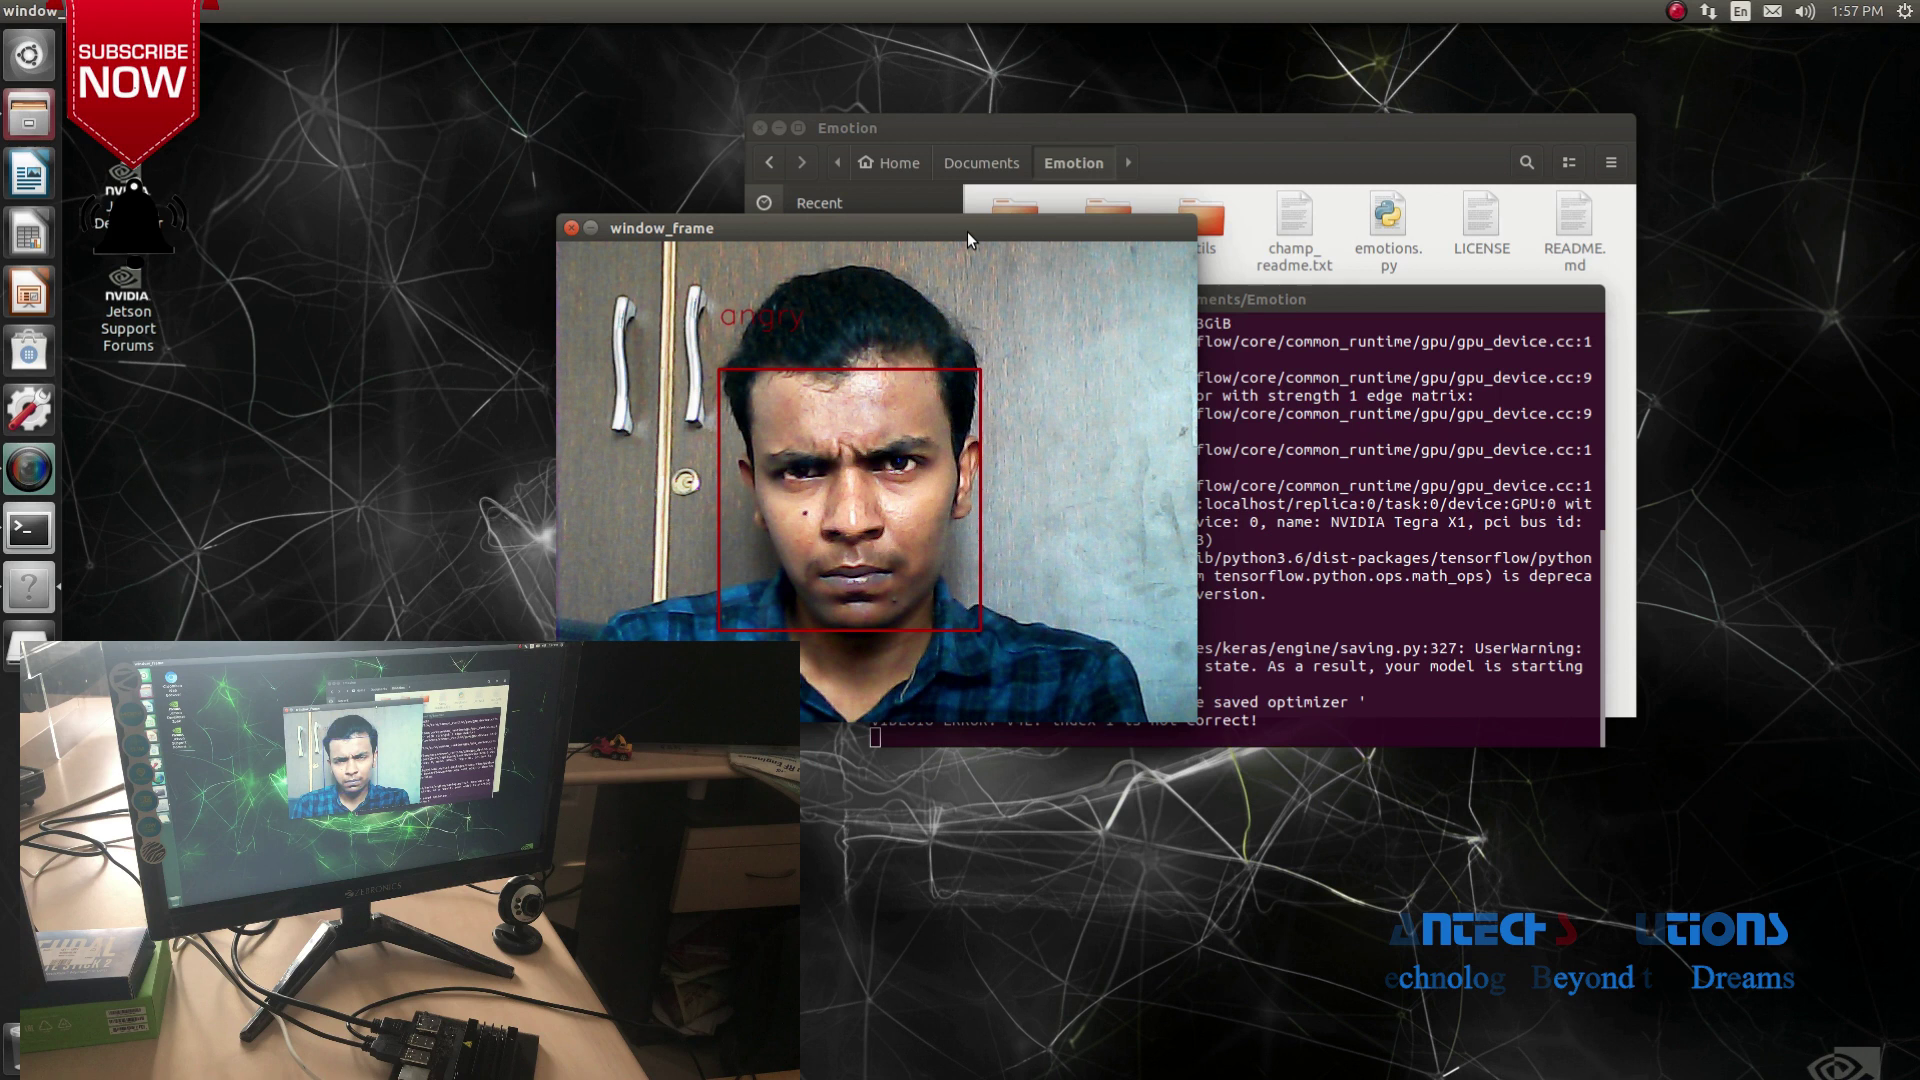 Face Expression Detection using Nvidia Jetson Nano